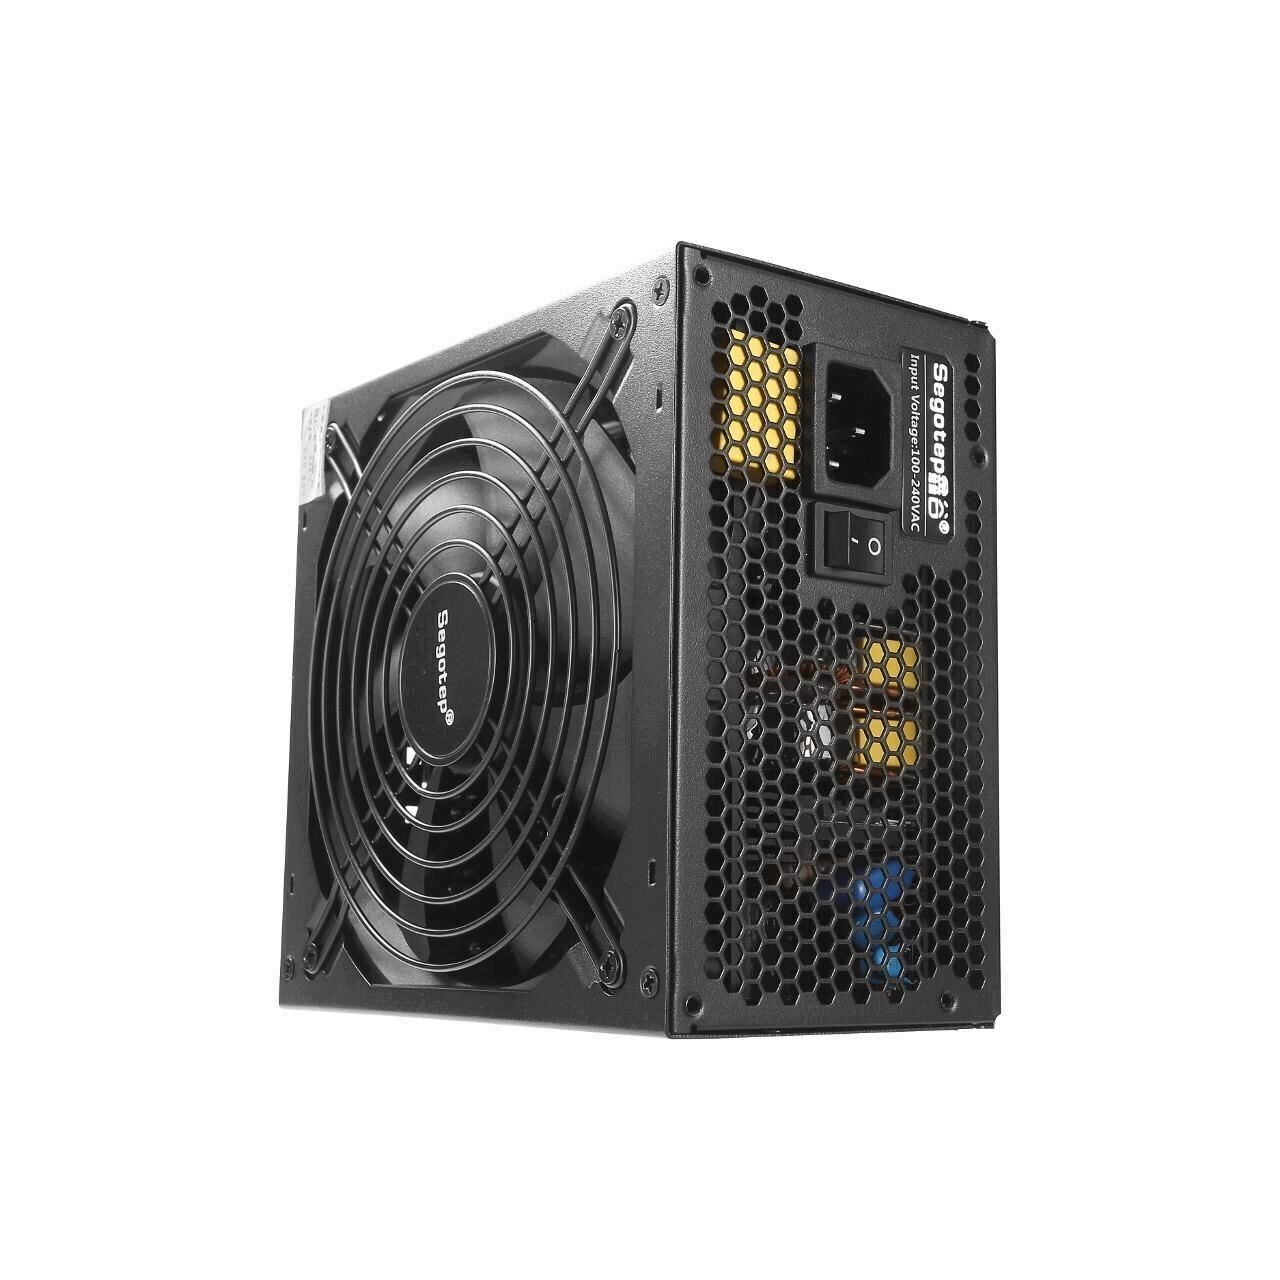 Sursa PC Segotep GP1350G V2 1250W